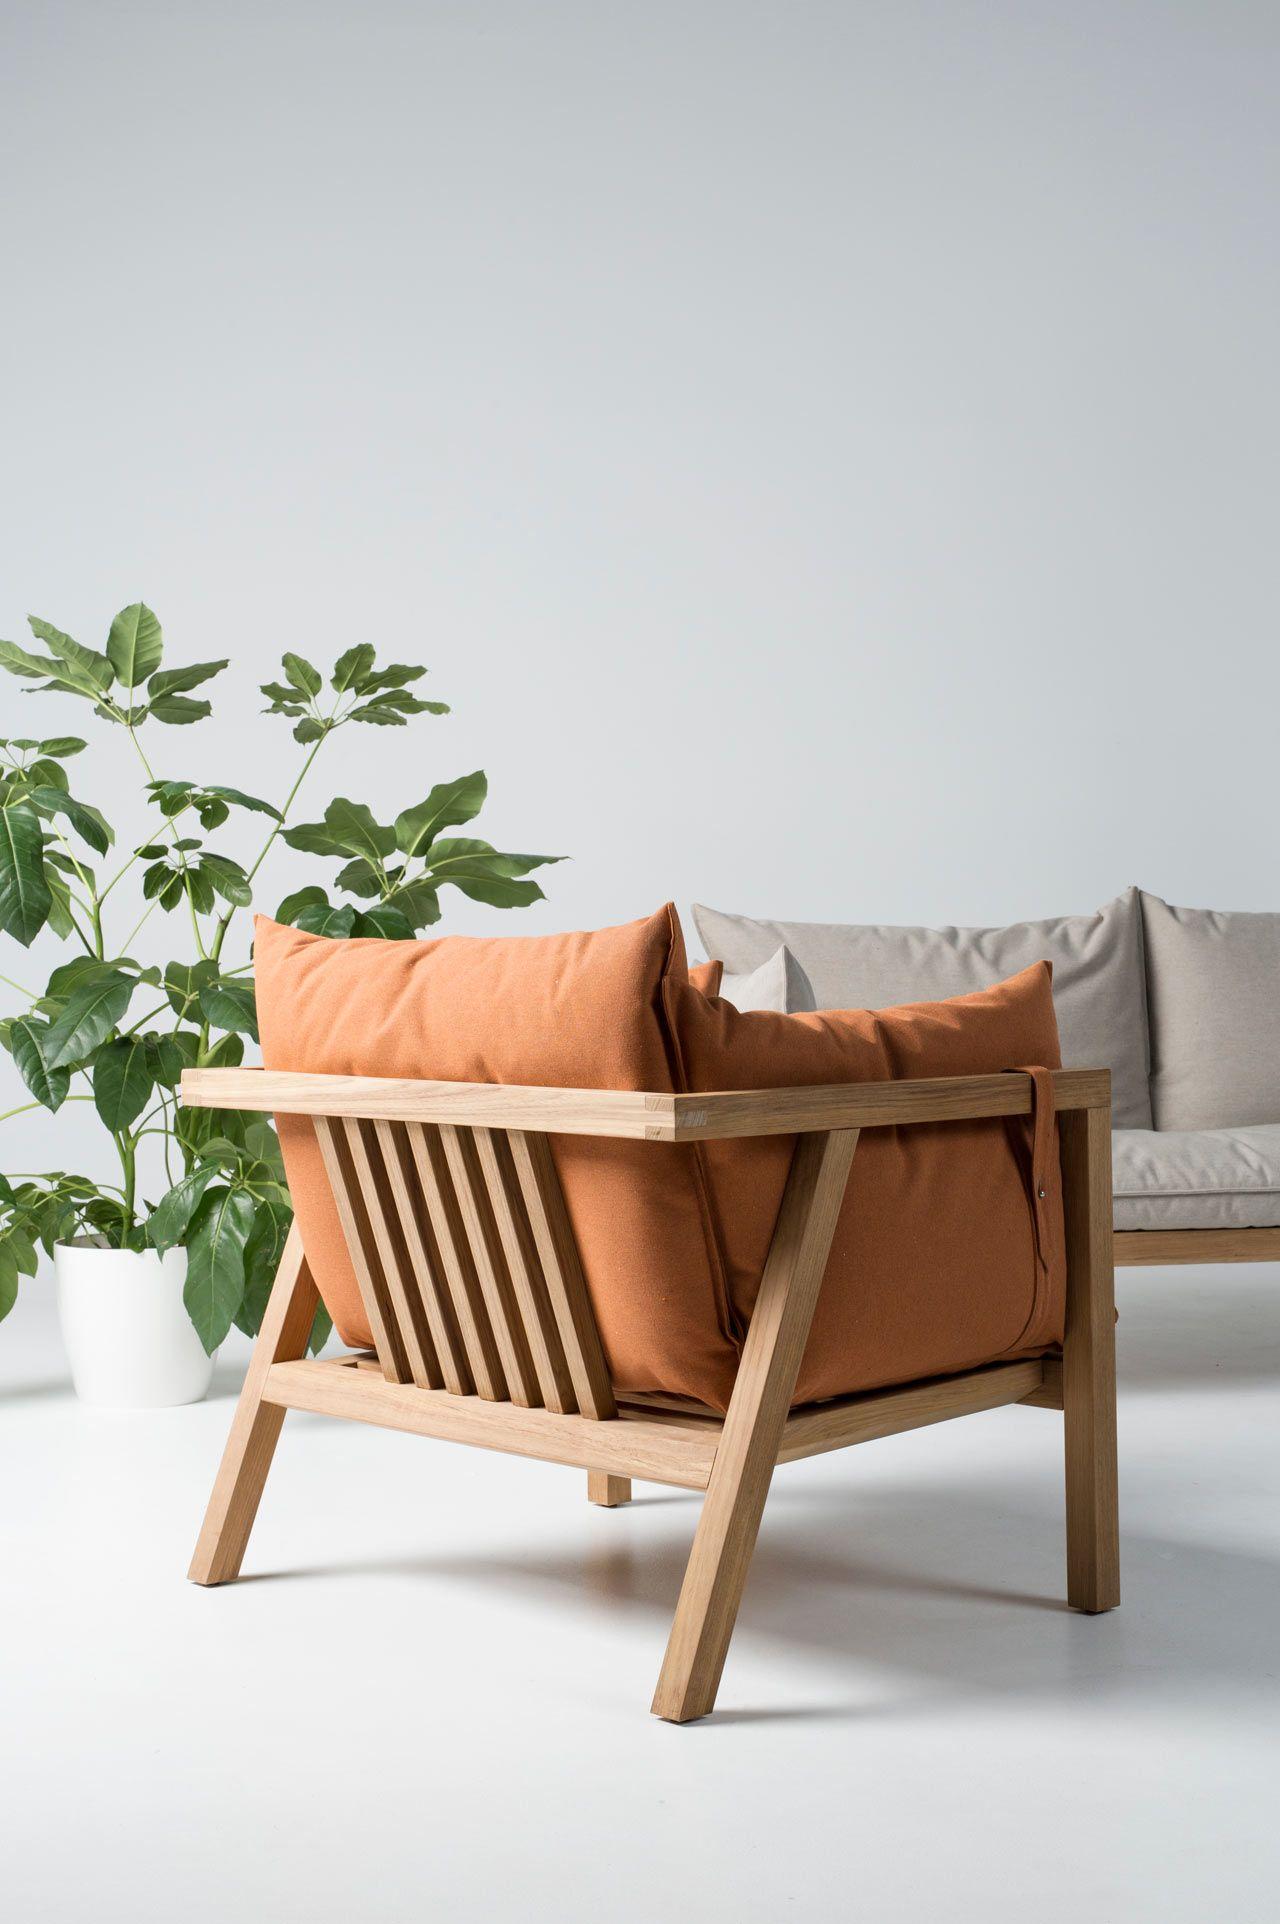 Umomoku A Comfortable Outdoor Furniture Collection Designed for Lounging  Design Milk